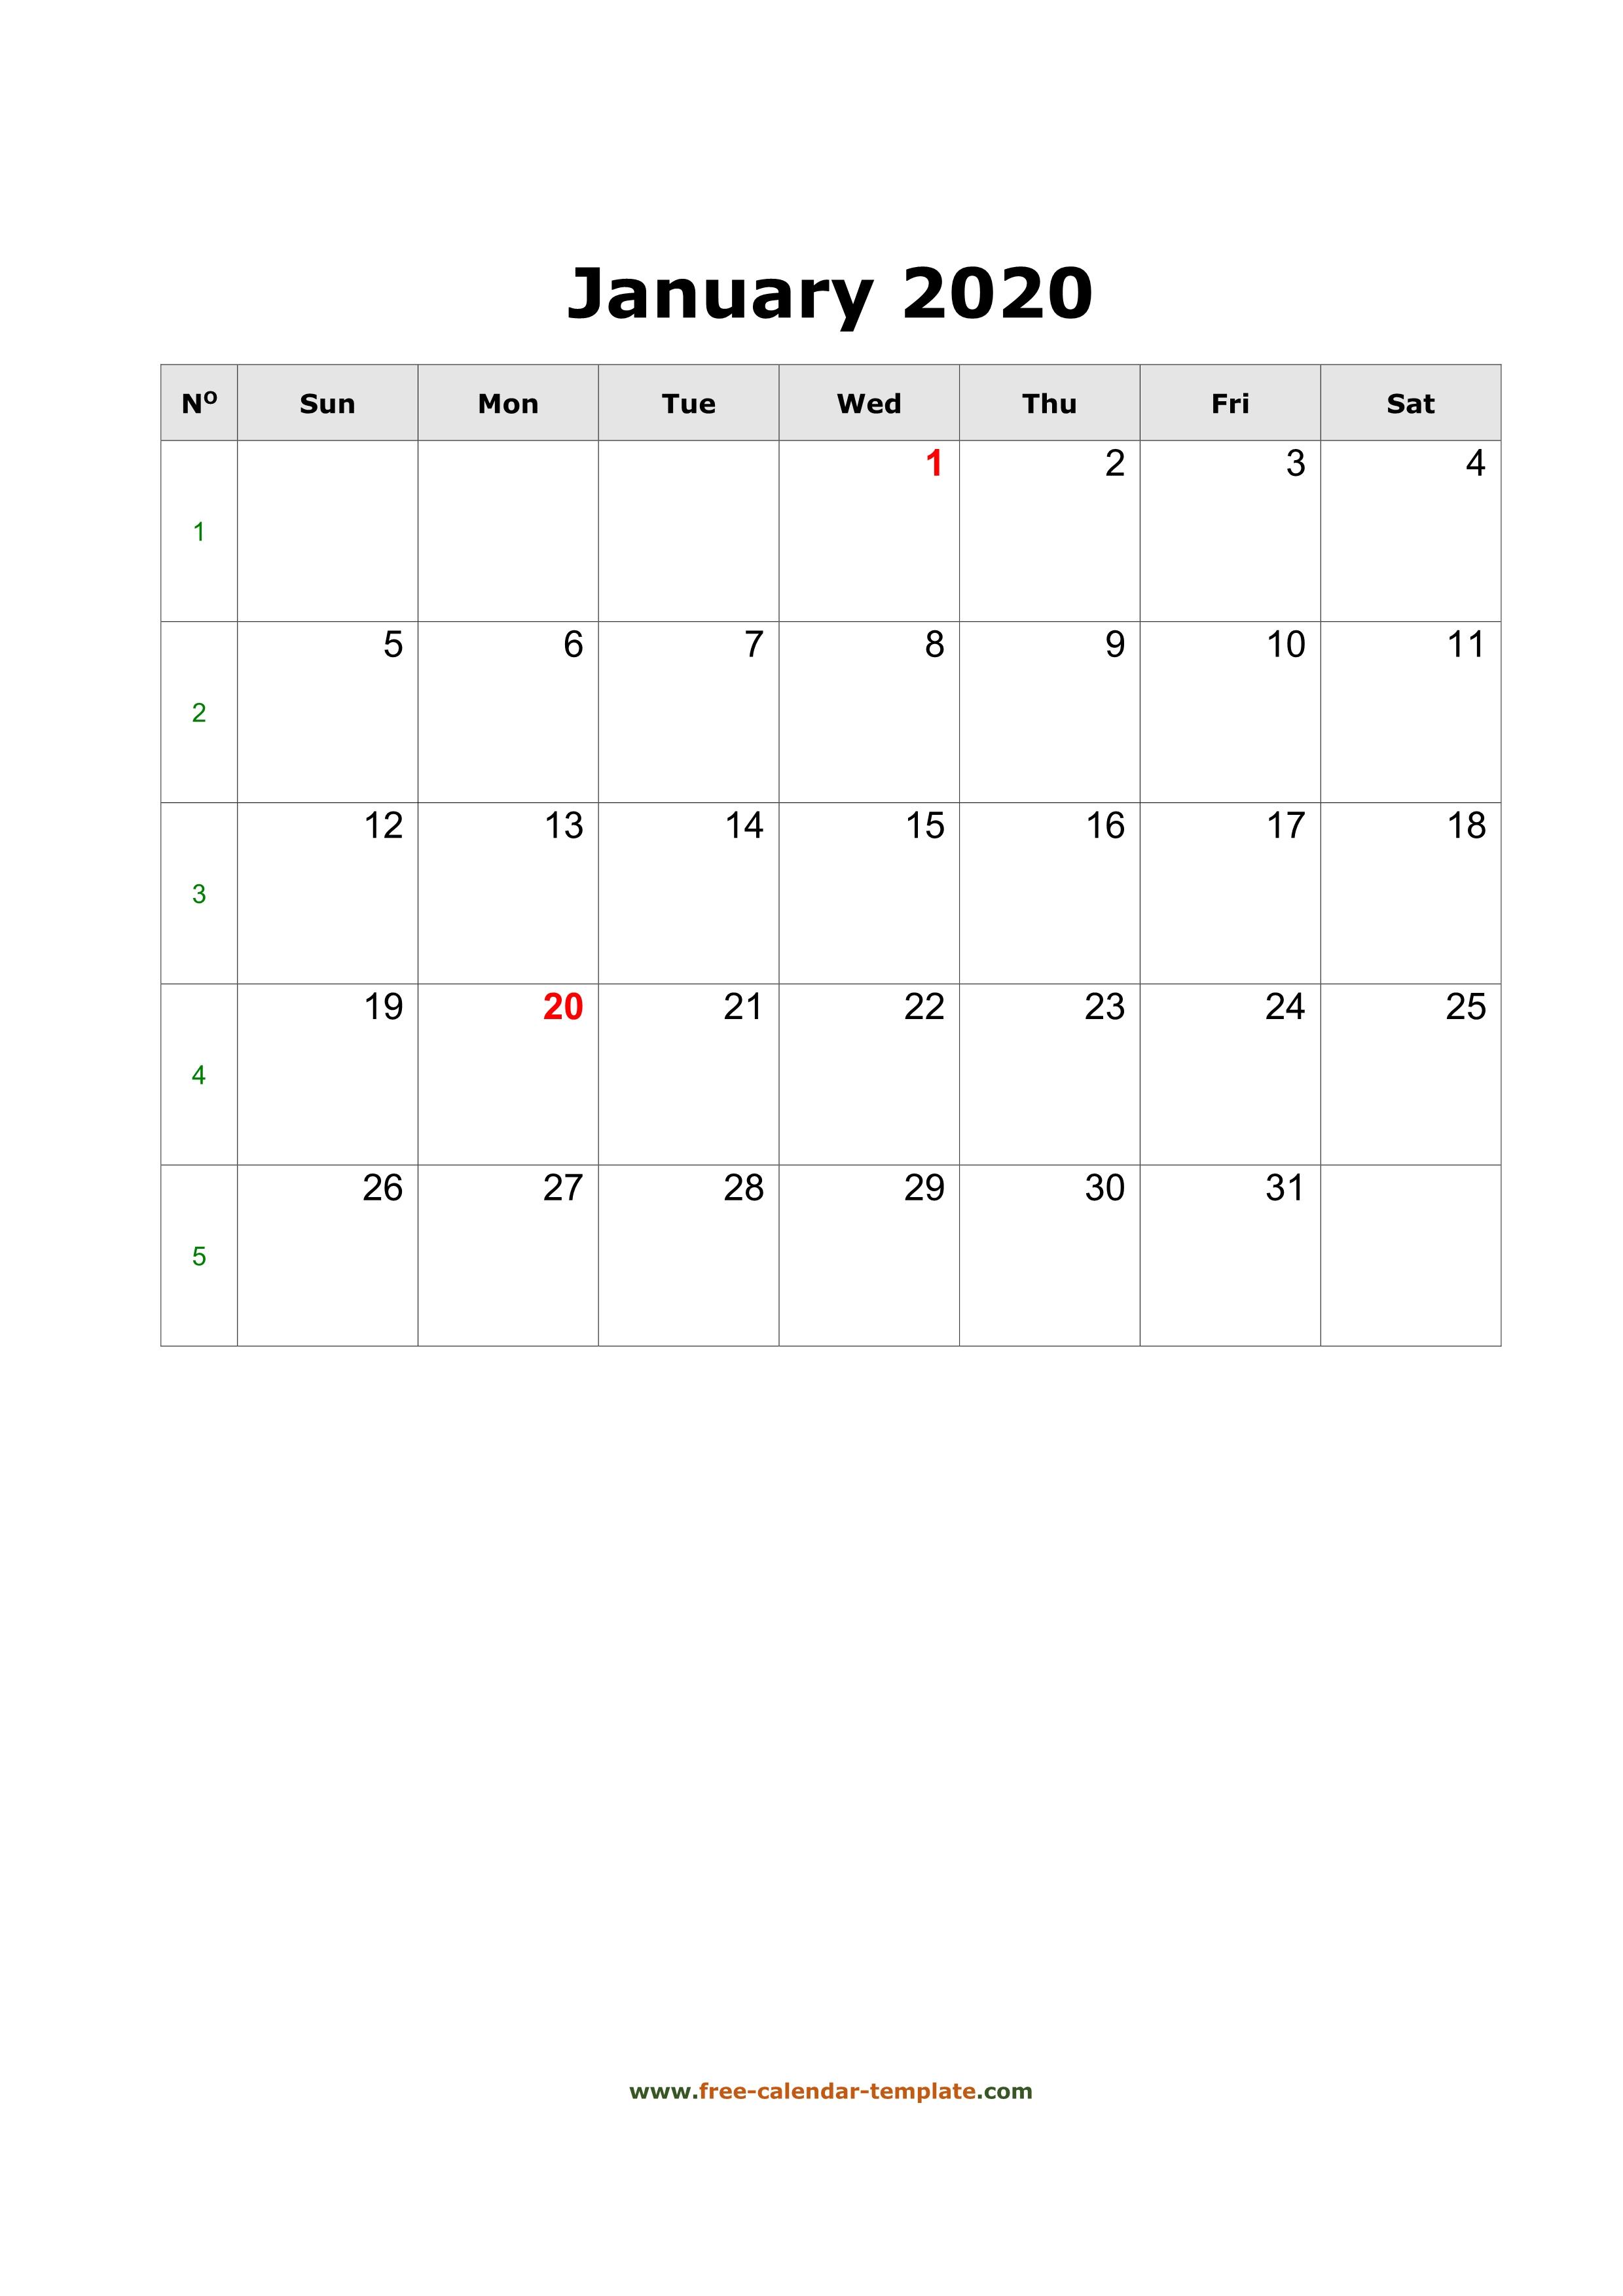 2020 January Calendar (Blank Vertical Template) | Free in Blank January Calendar 2020